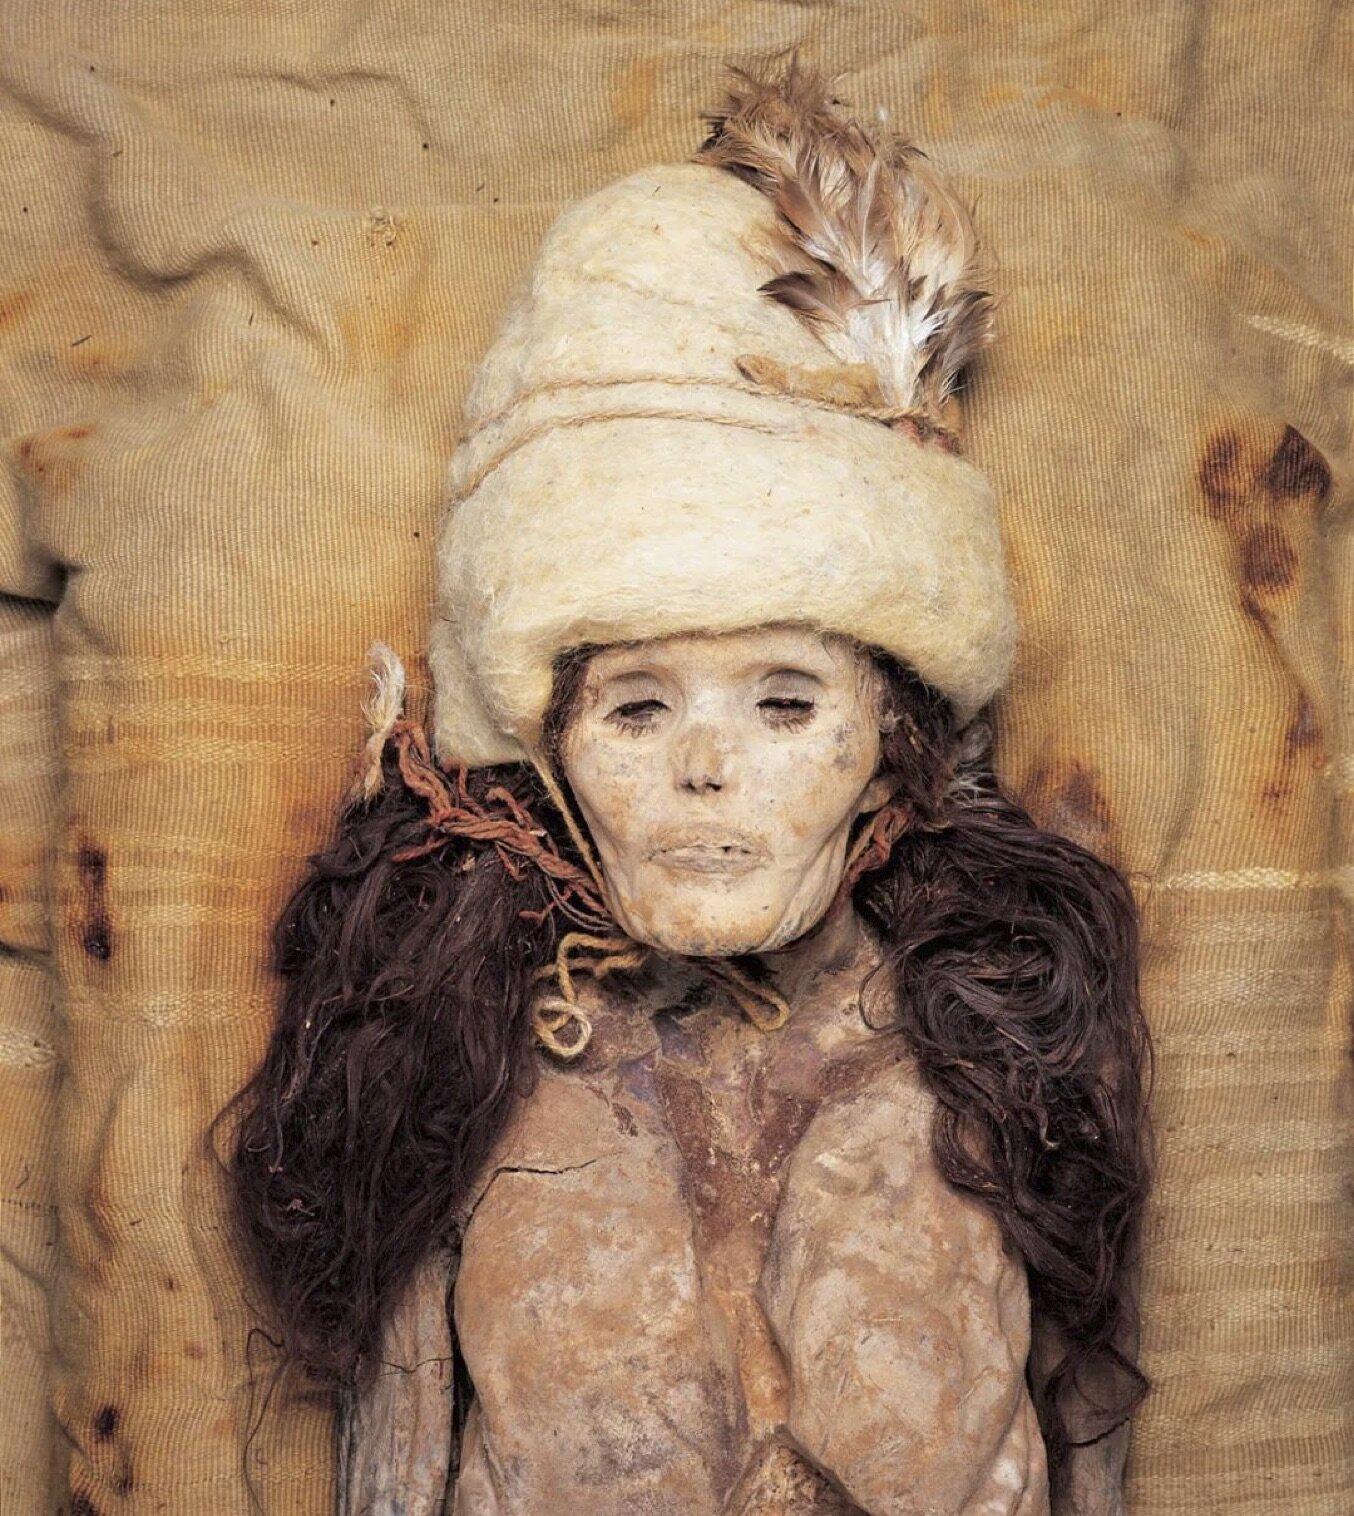 The surprising origins of the Tarim Basin mummies